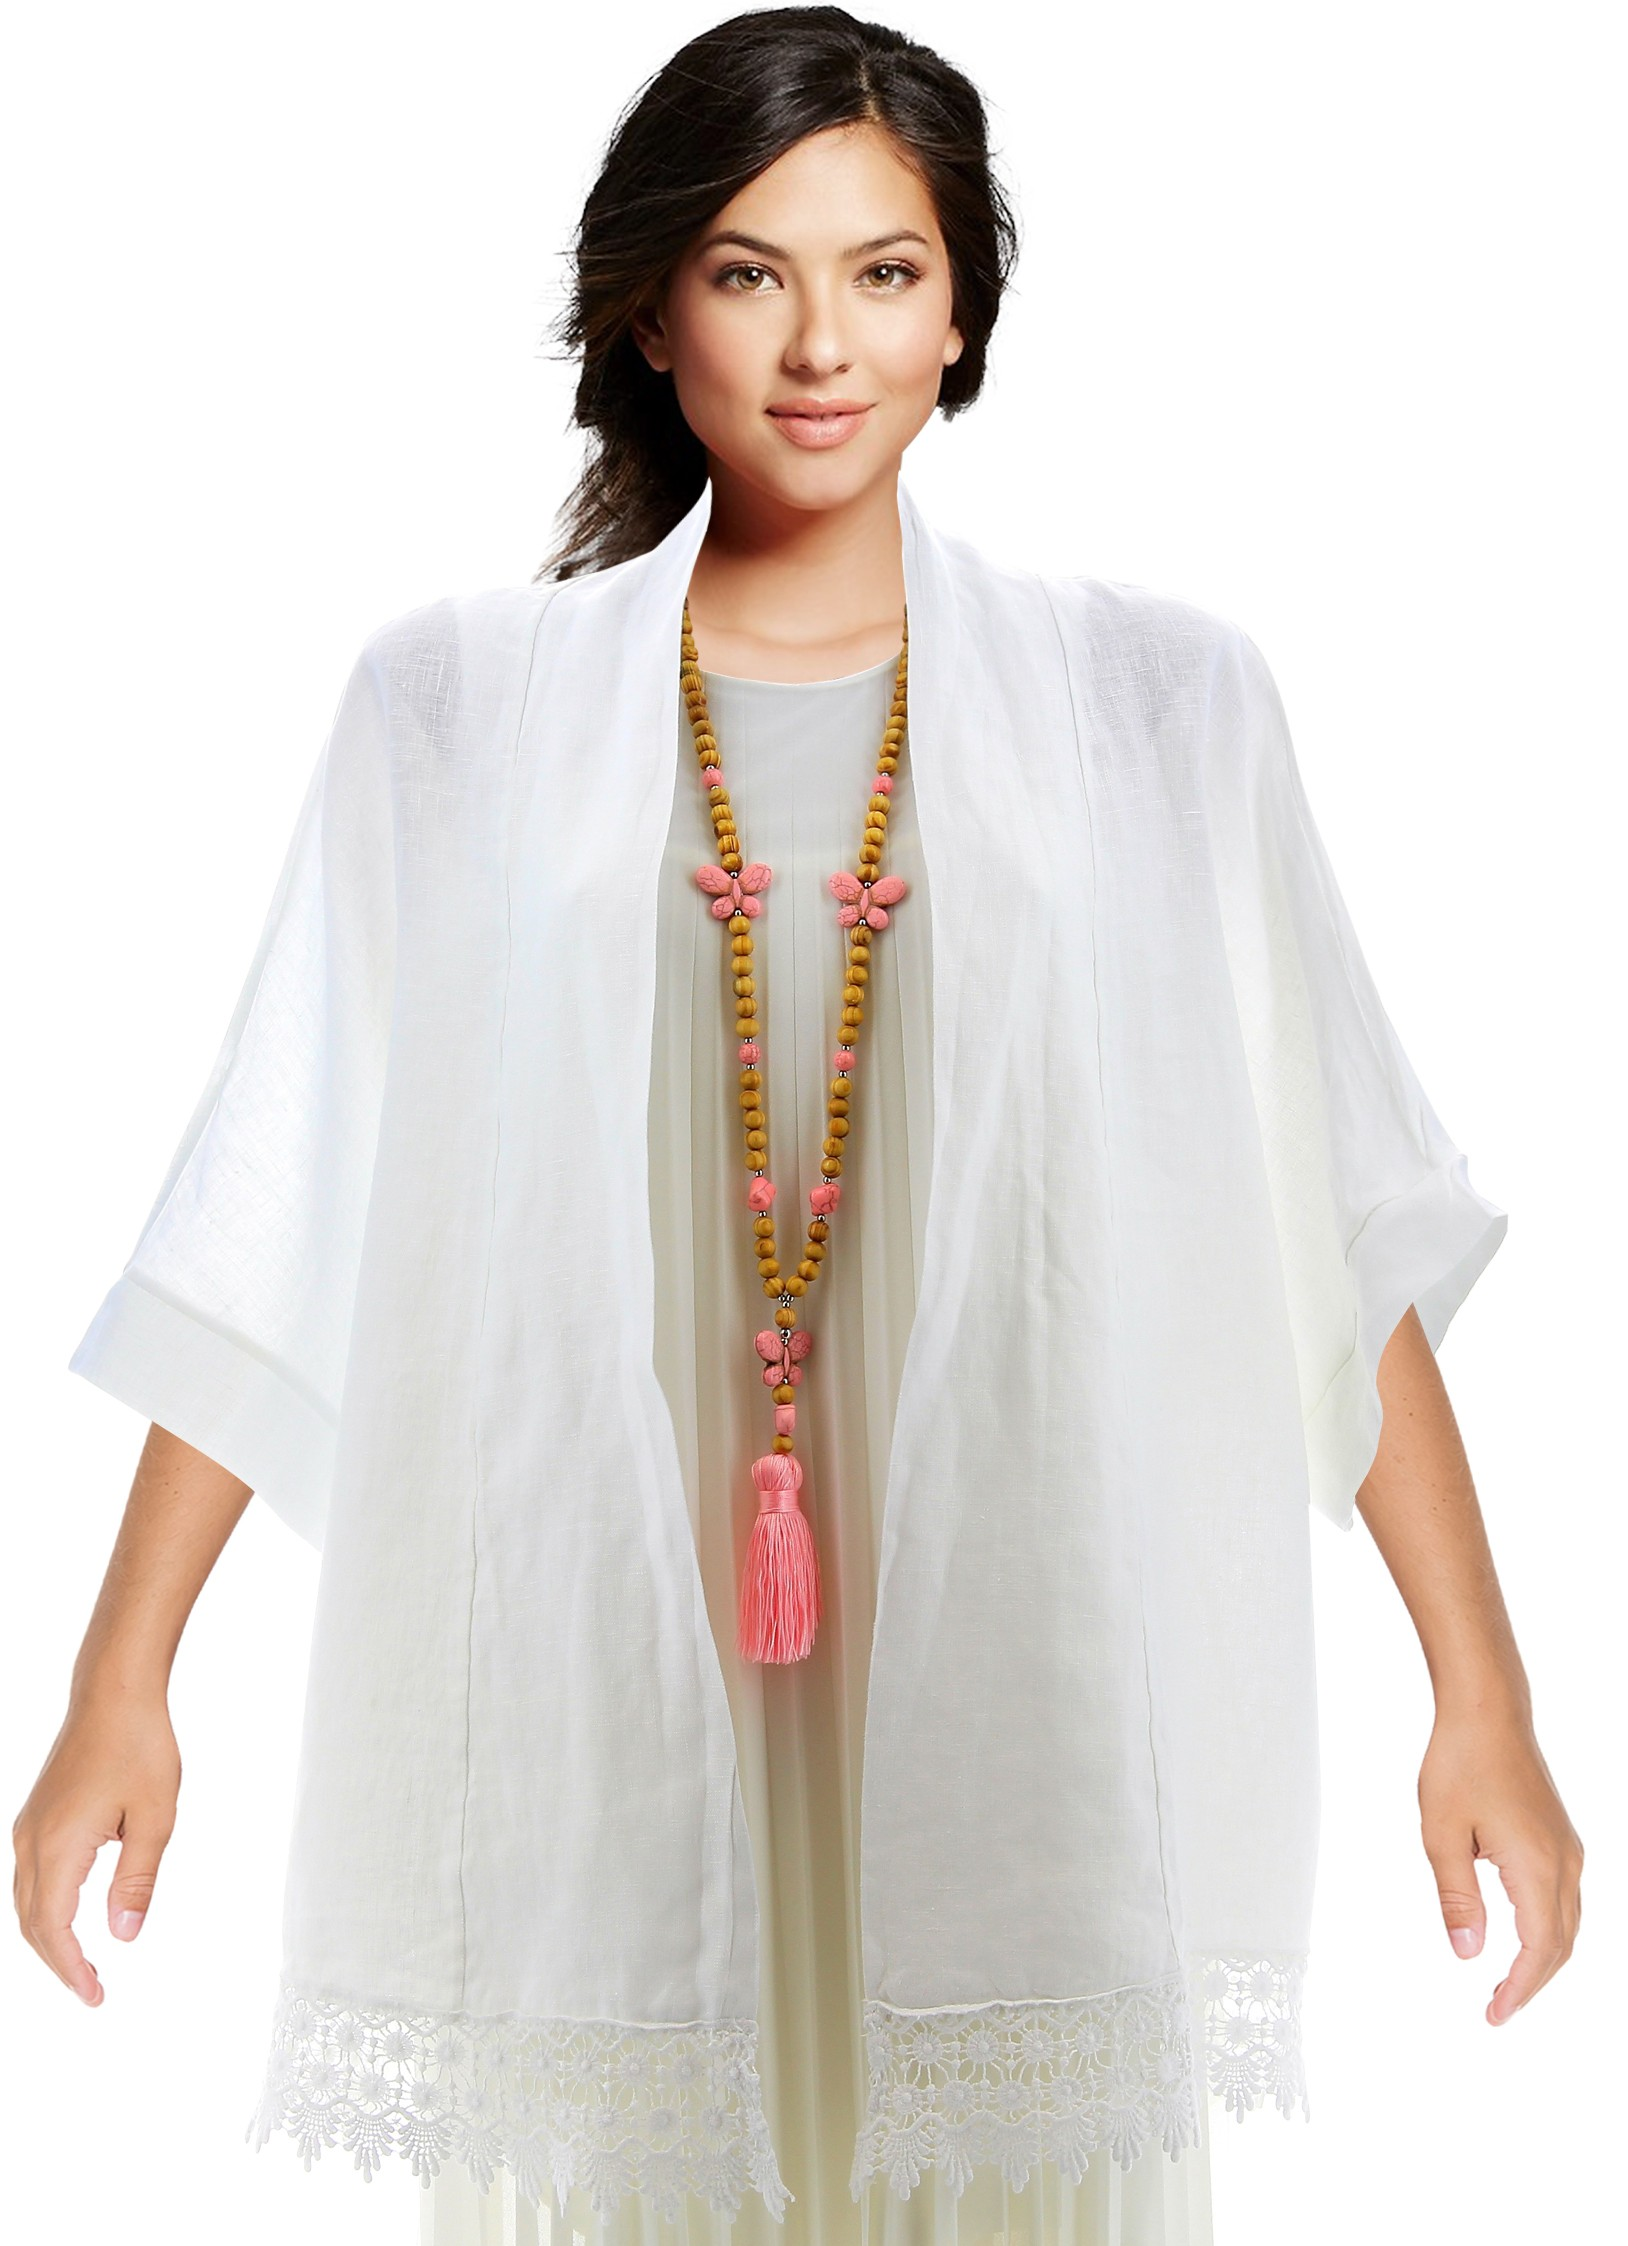 Veste blanche femme robe